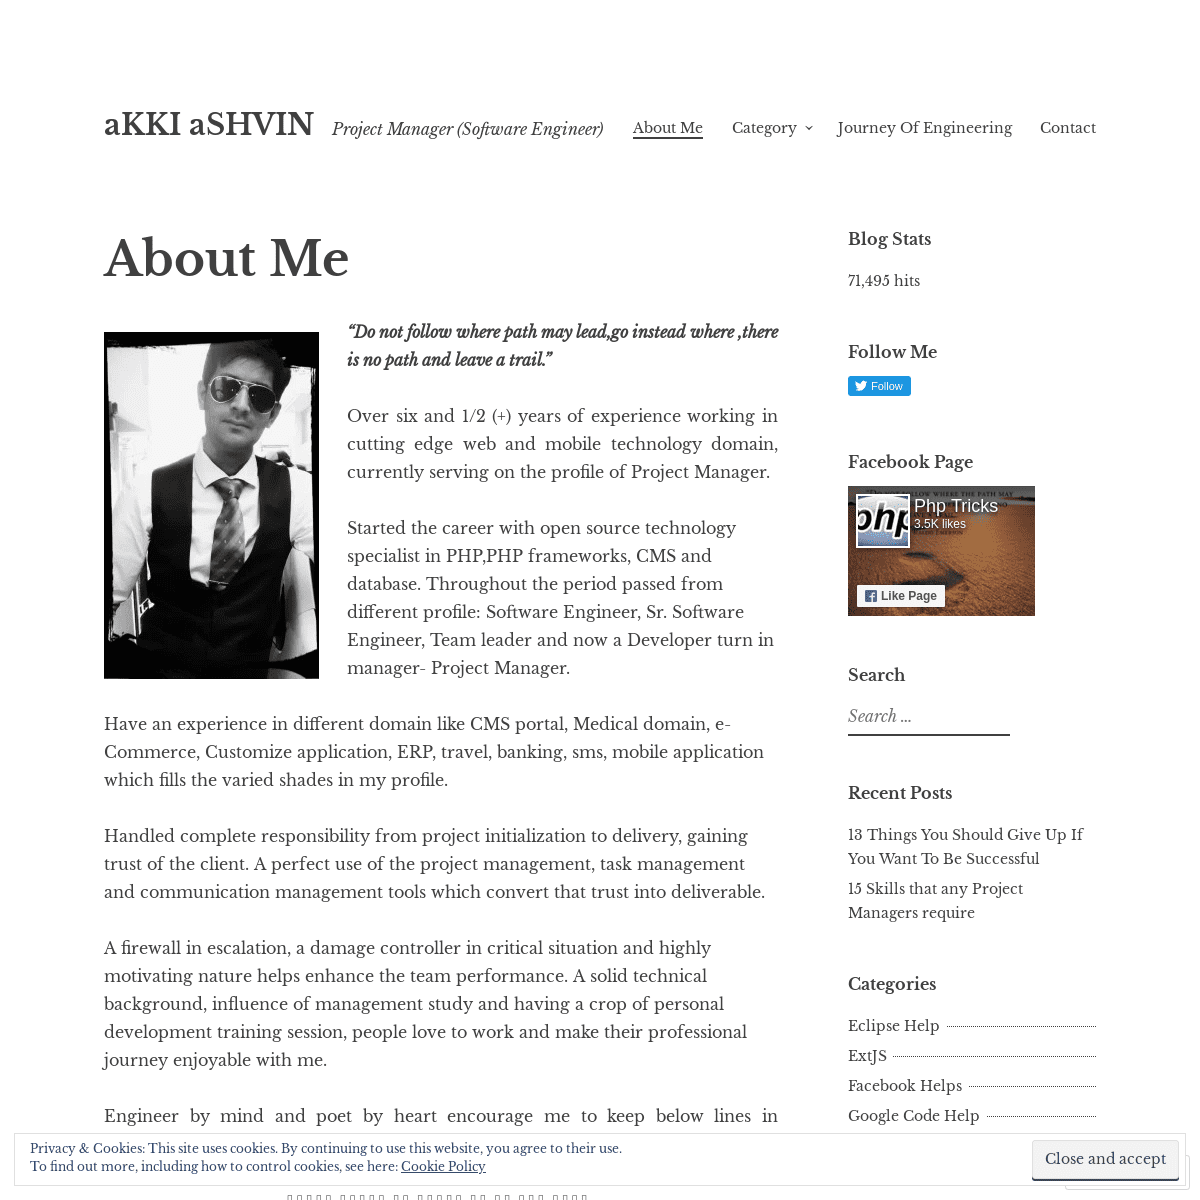 aKKI aSHVIN – Project Manager (Software Engineer)